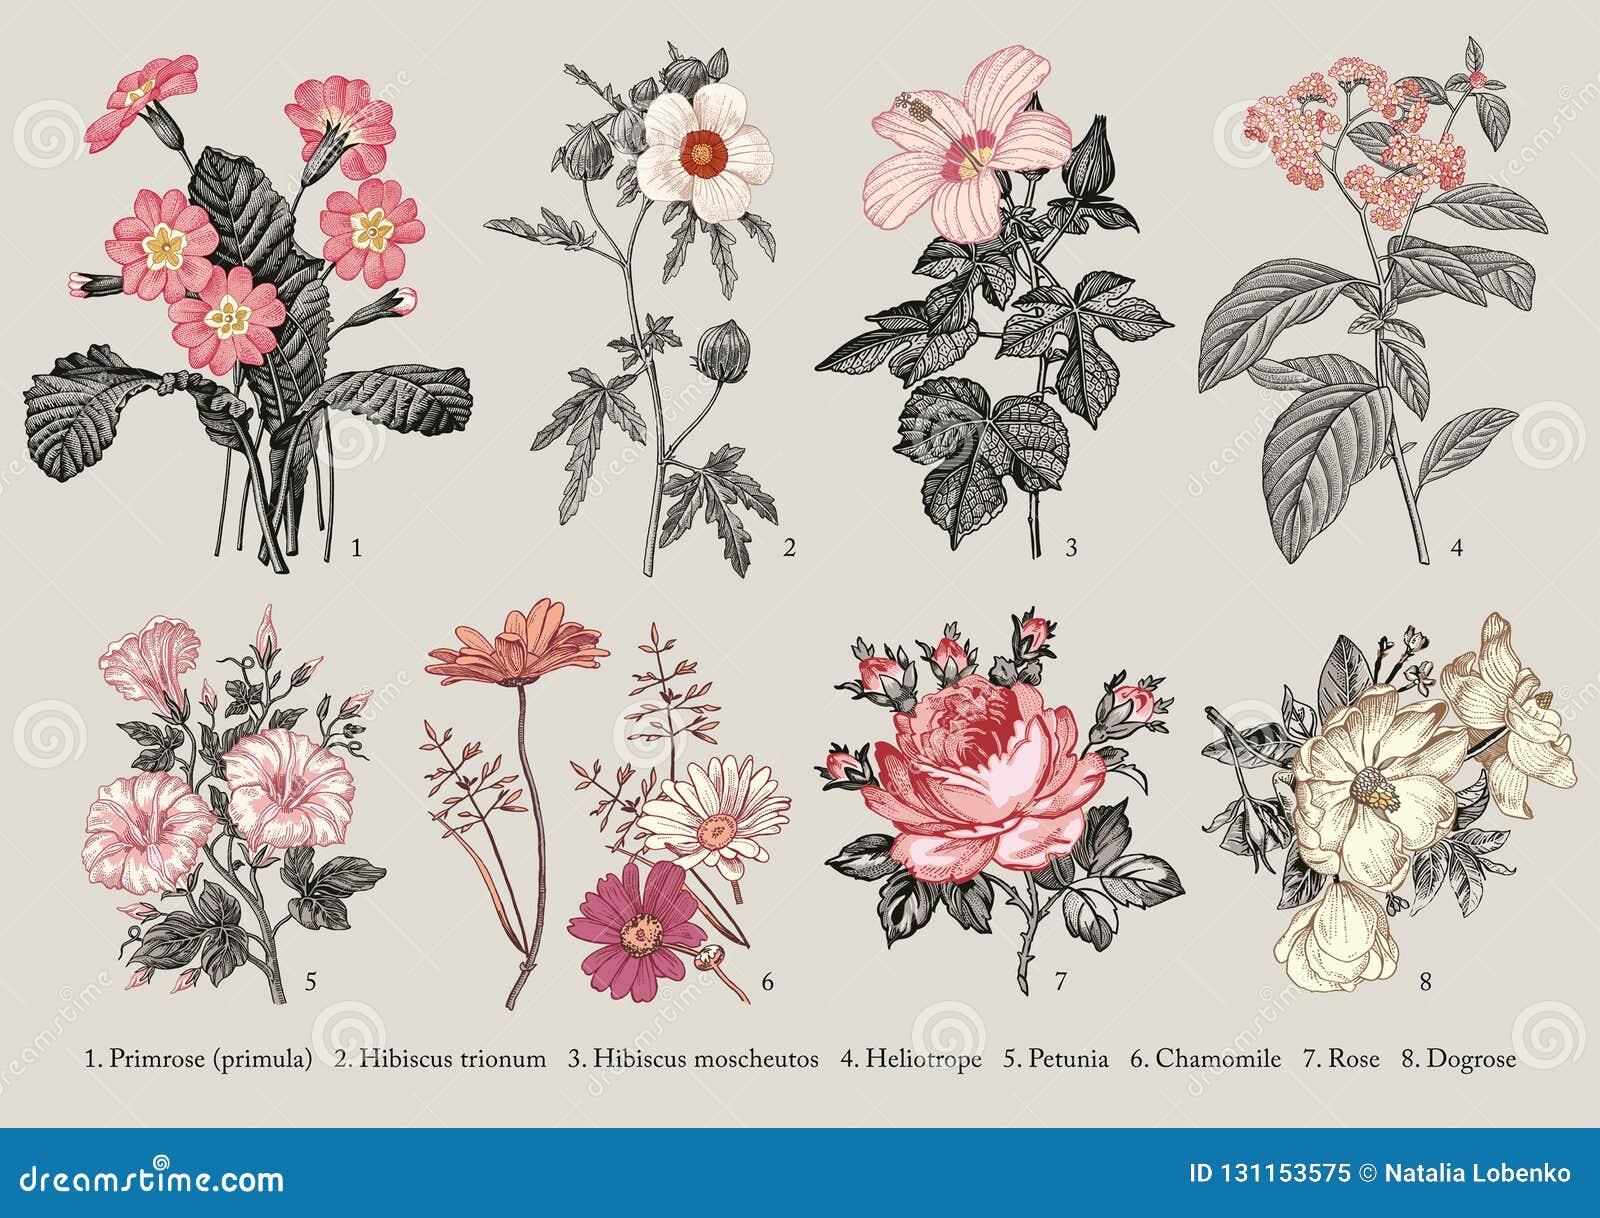 Botany Set flowers Drawing engraving Vector victorian Illustration Primrose Hibiscus Heliotrope Petunia Chamomile Rose, Dogrose